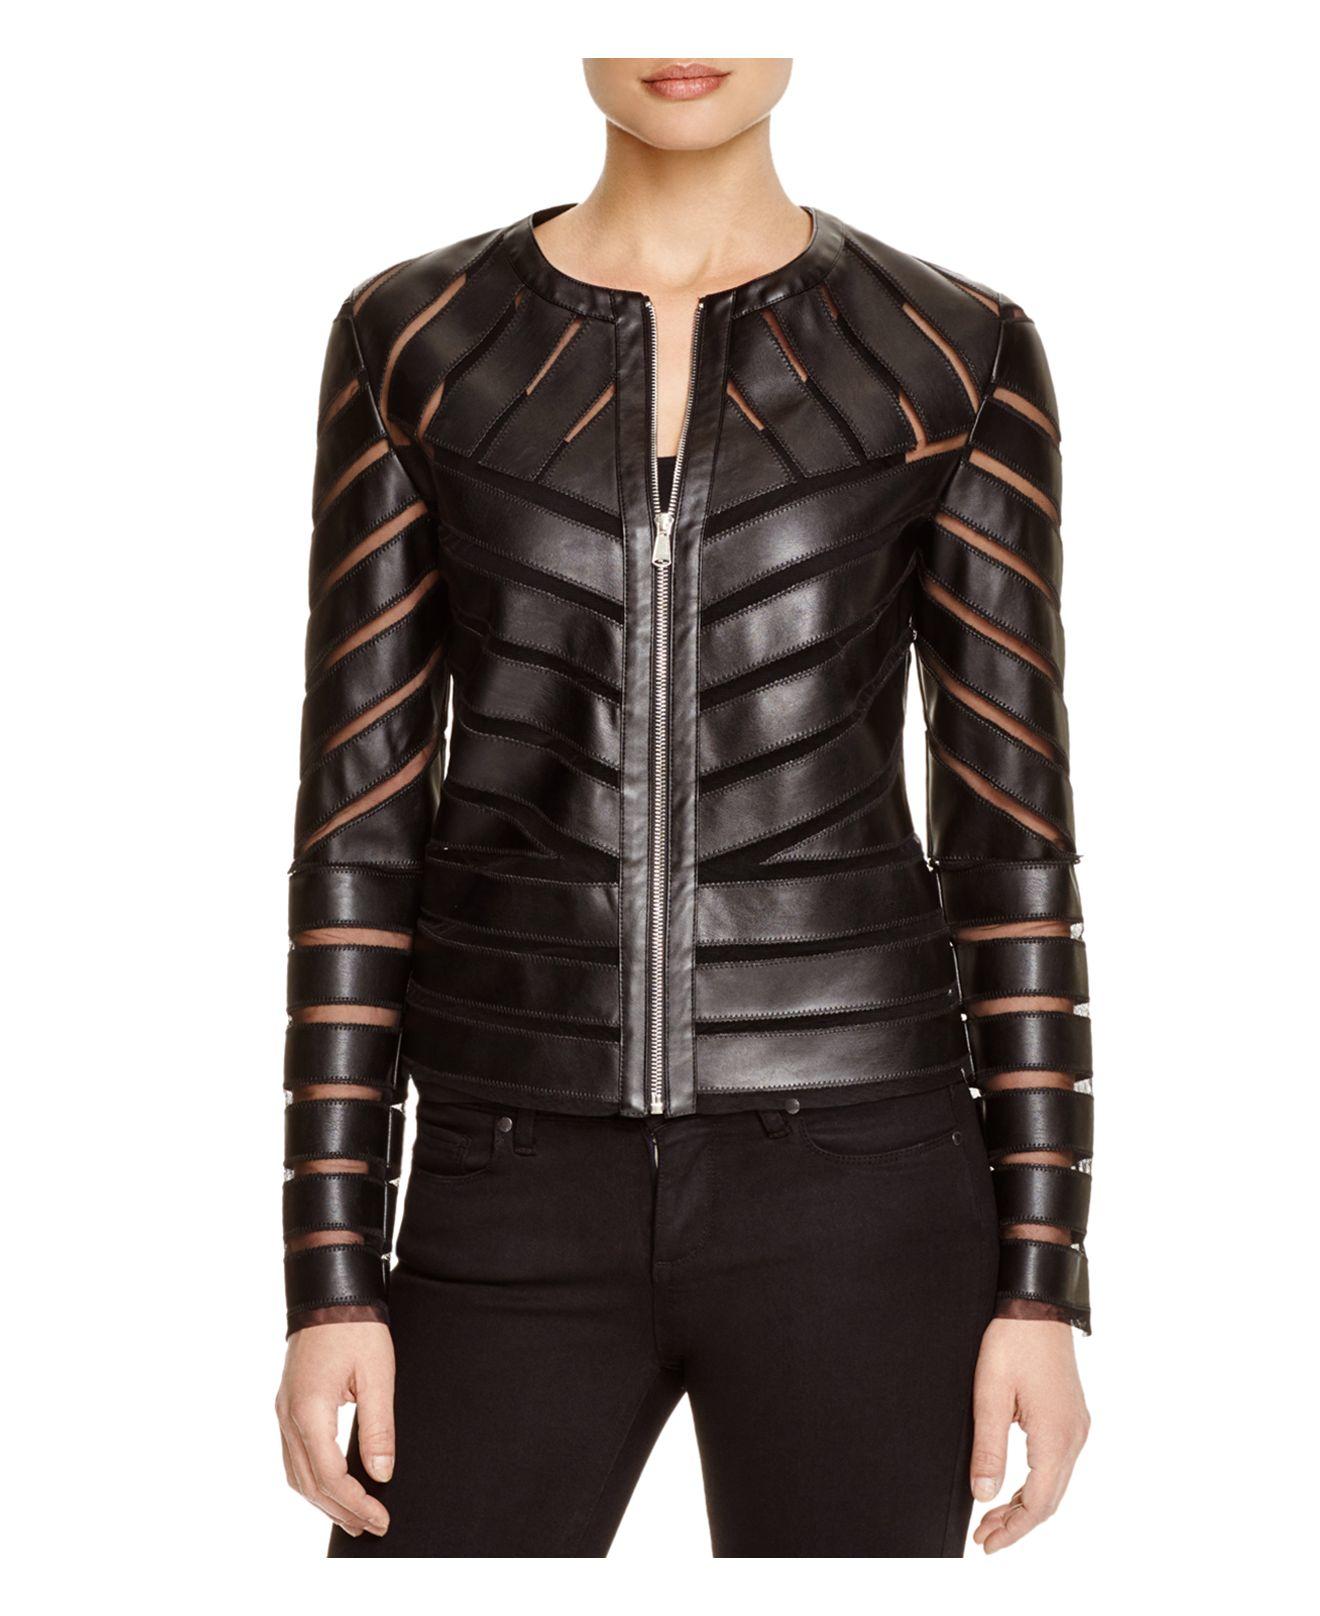 Bagatelle leather jackets